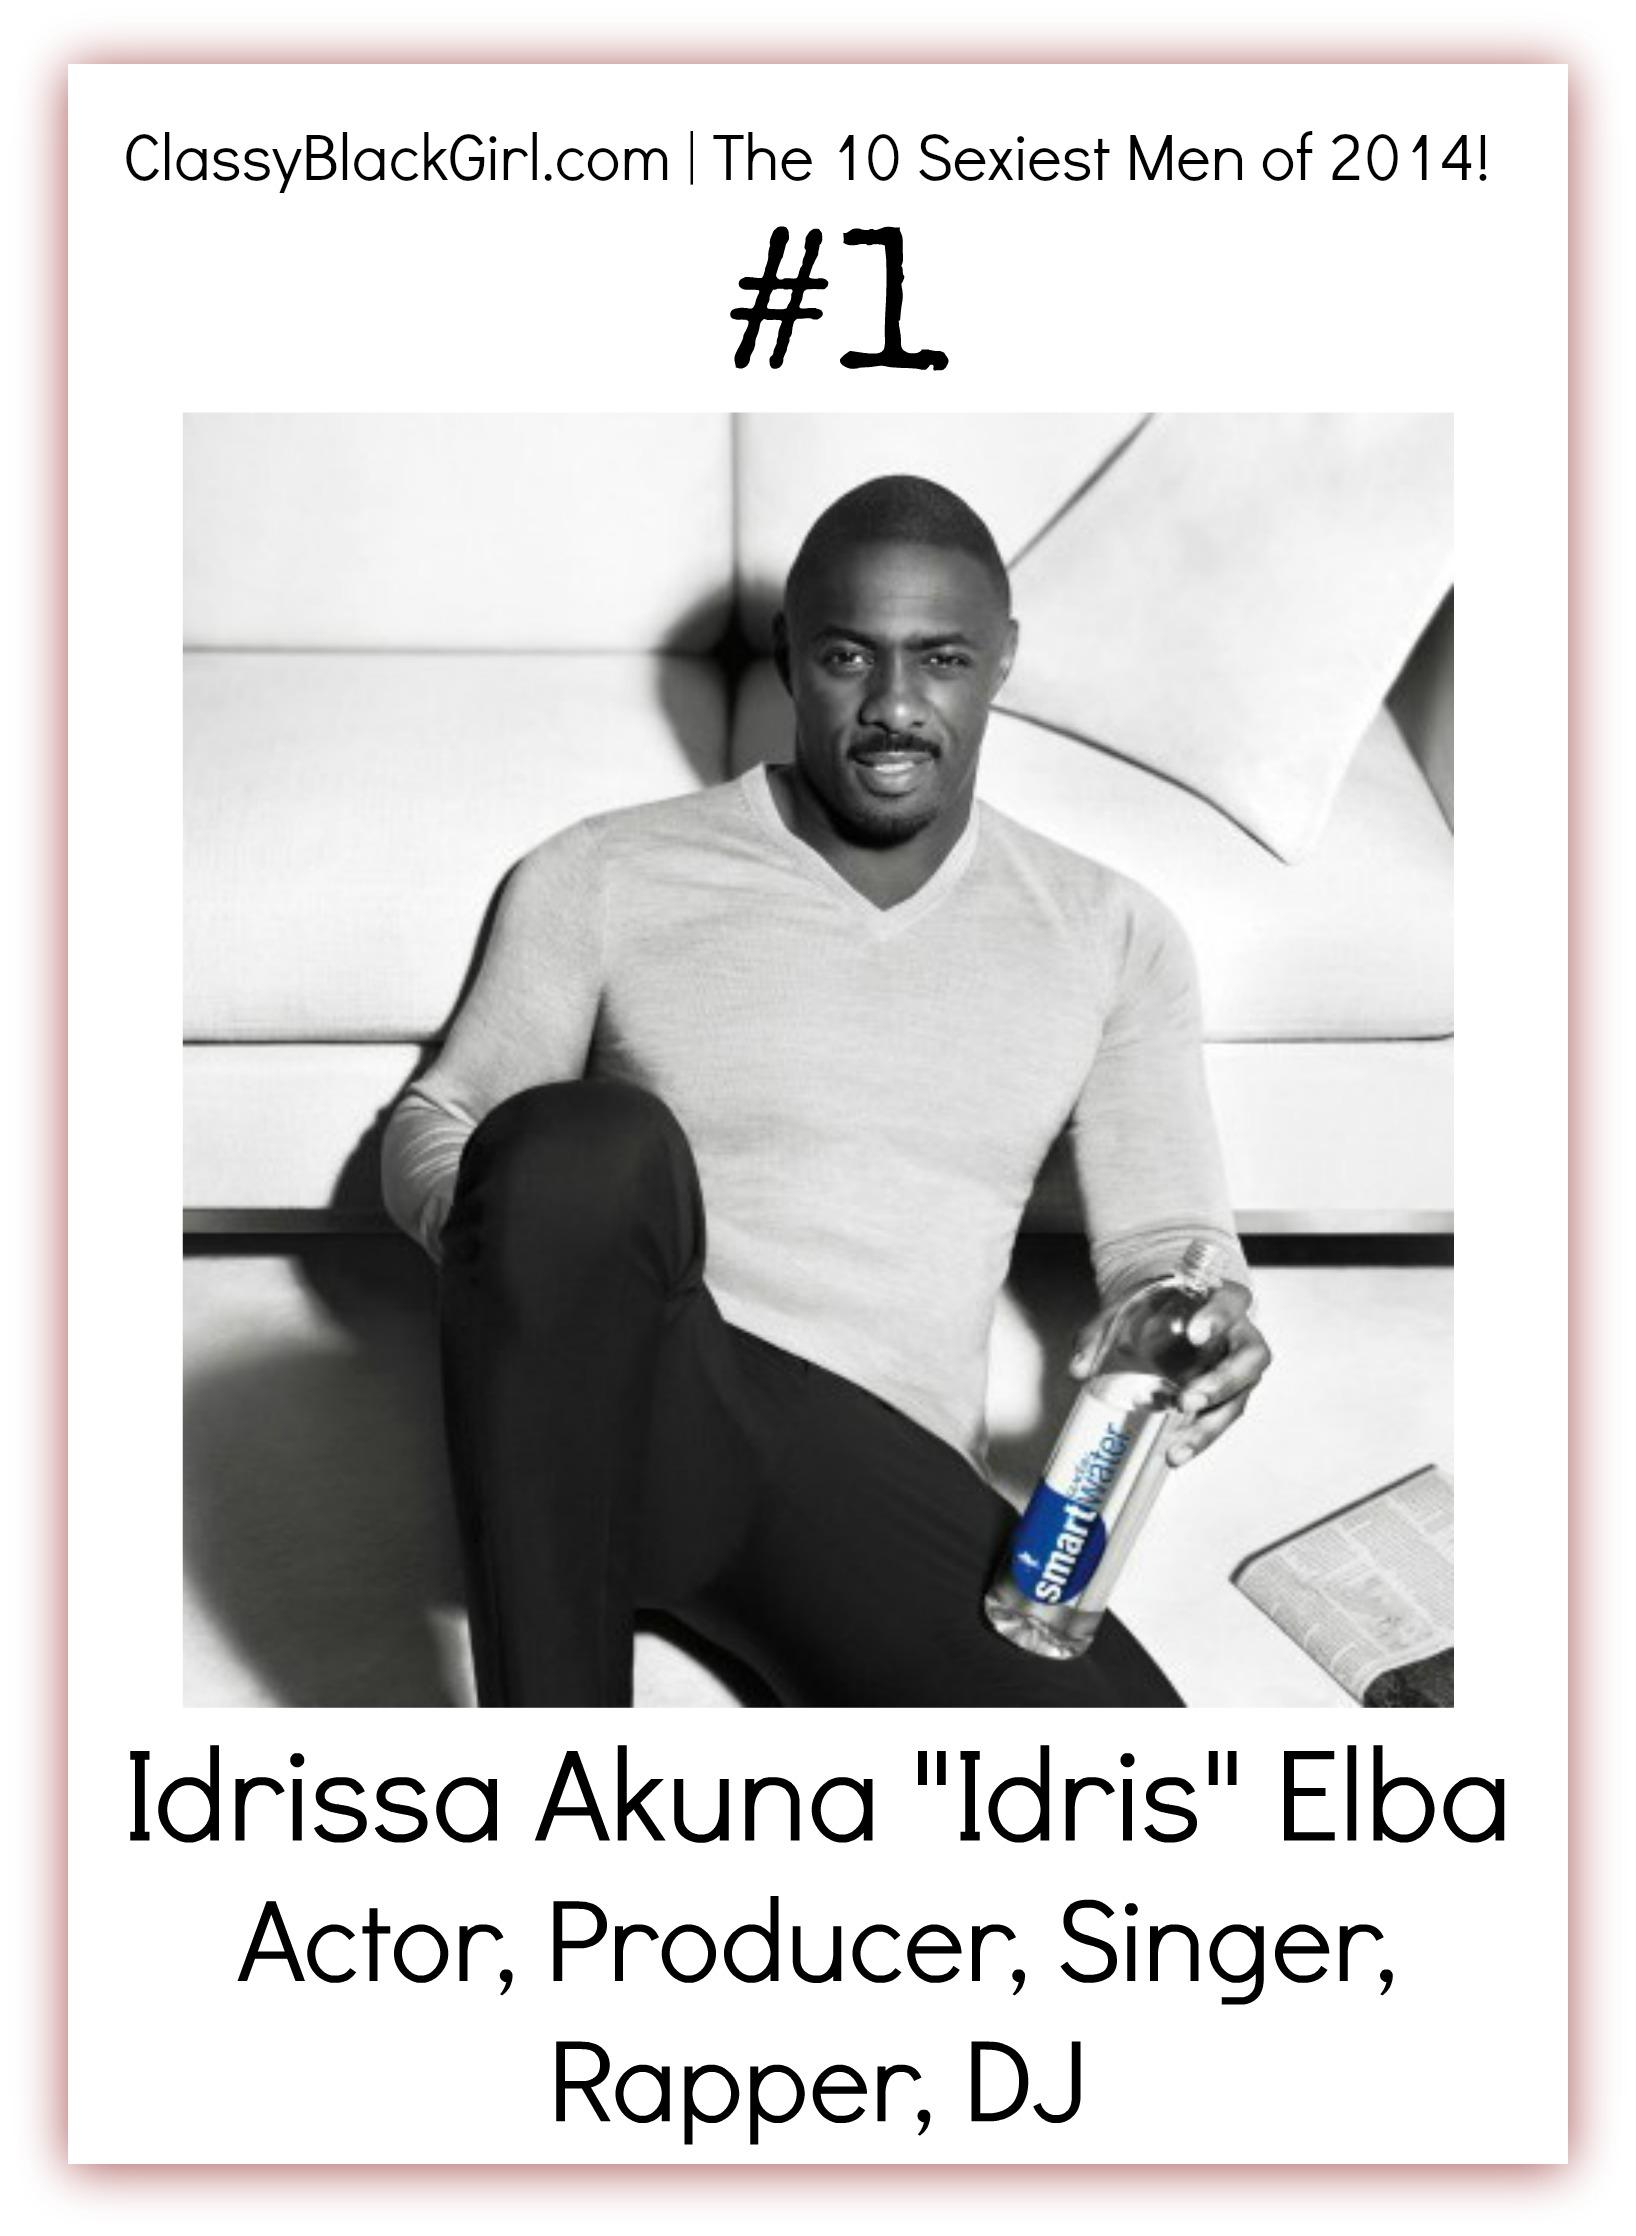 Idris Elba #ClassyBlackGirl Sexiest Men of 2014